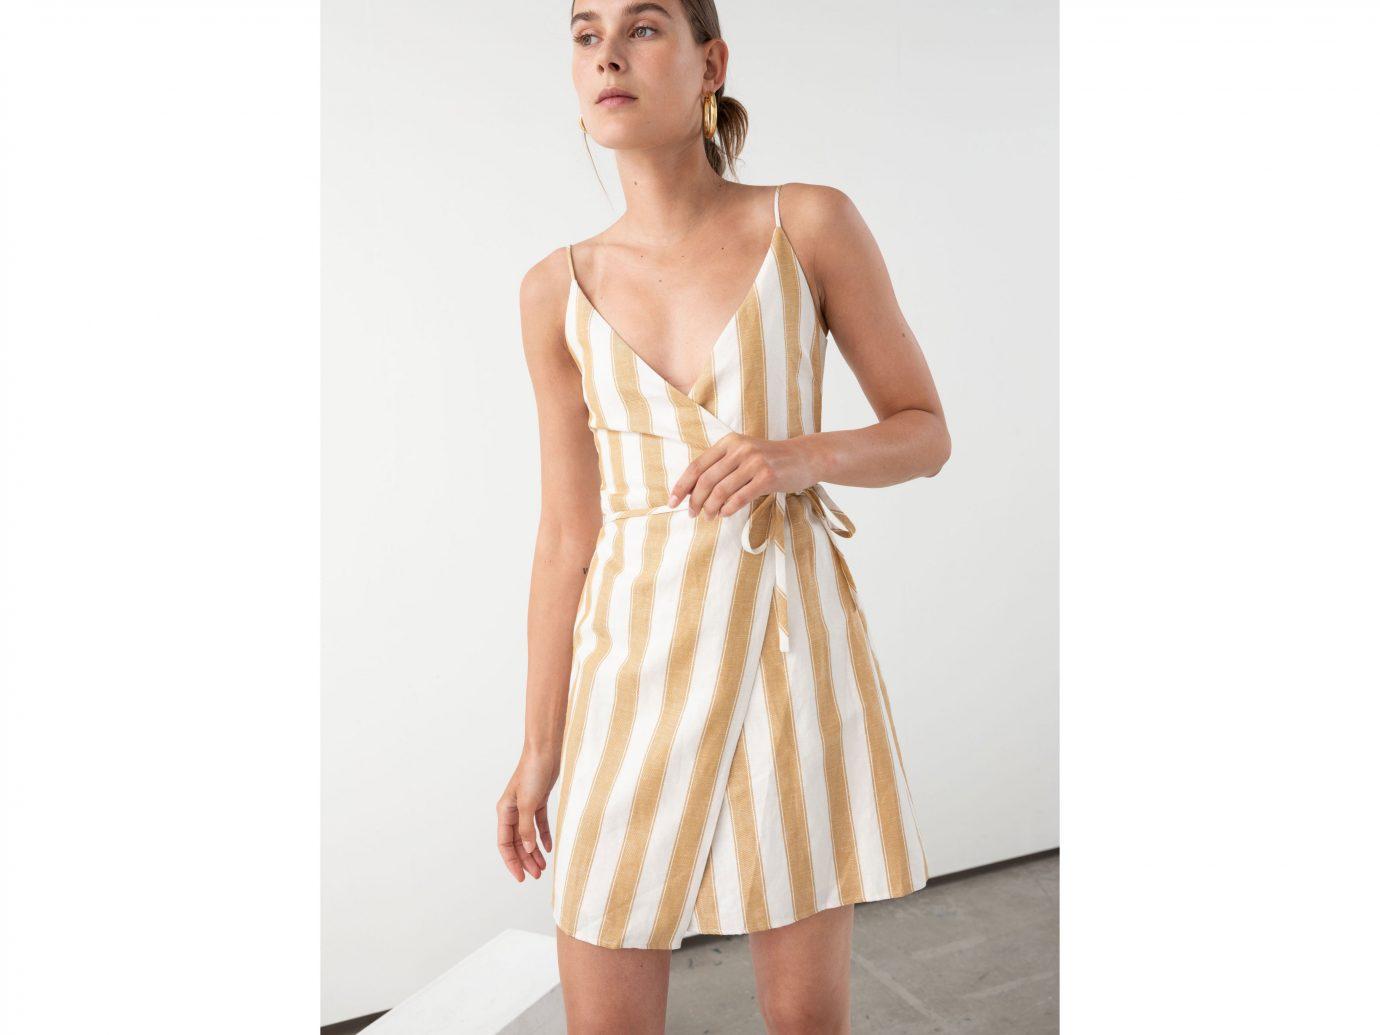 & Other Stories Striped Cotton Linen Mini Wrap Dress